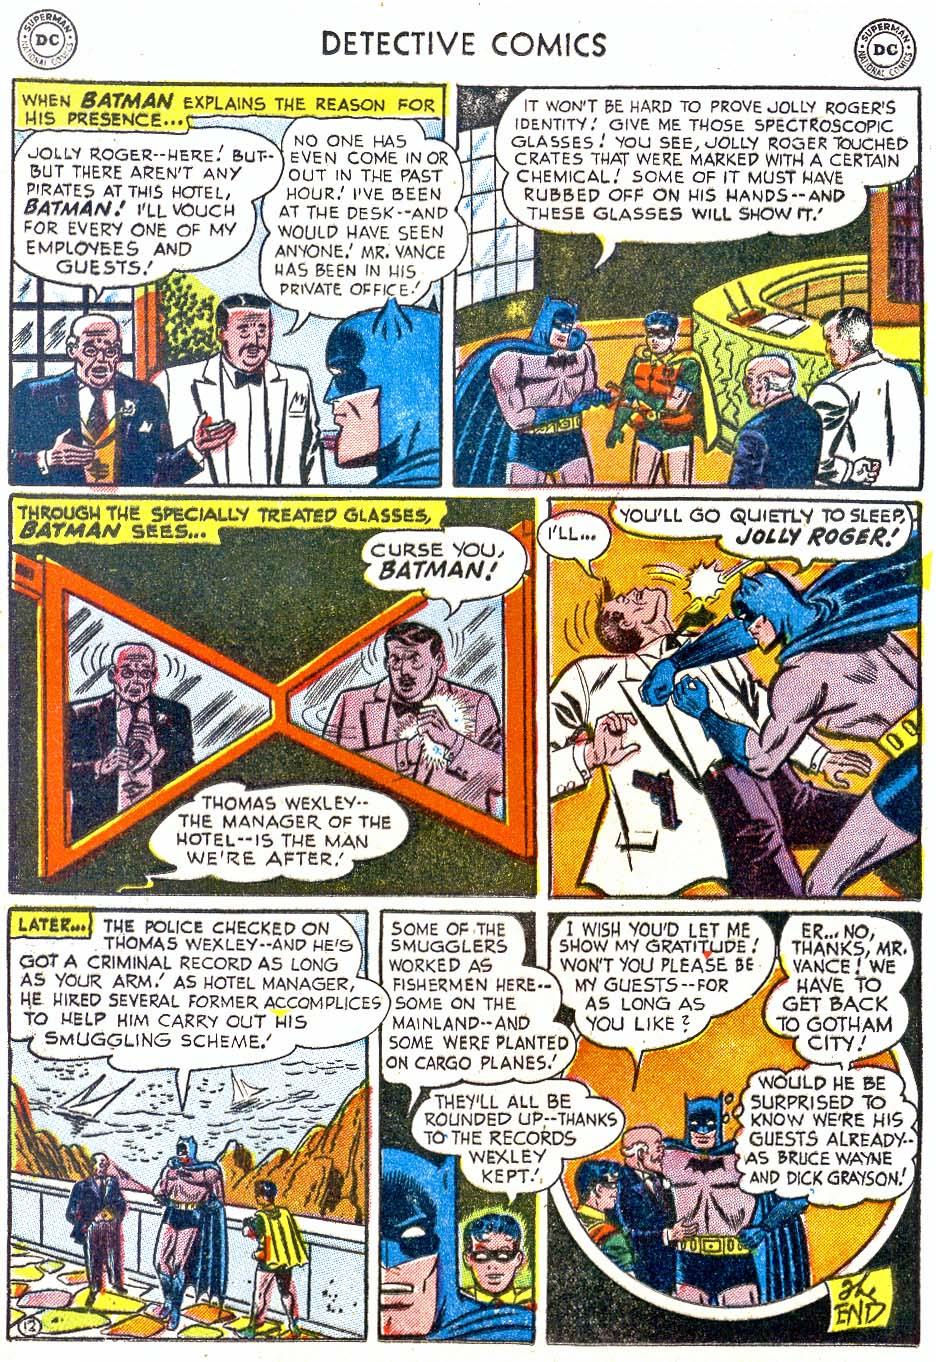 Detective Comics (1937) 202 Page 13